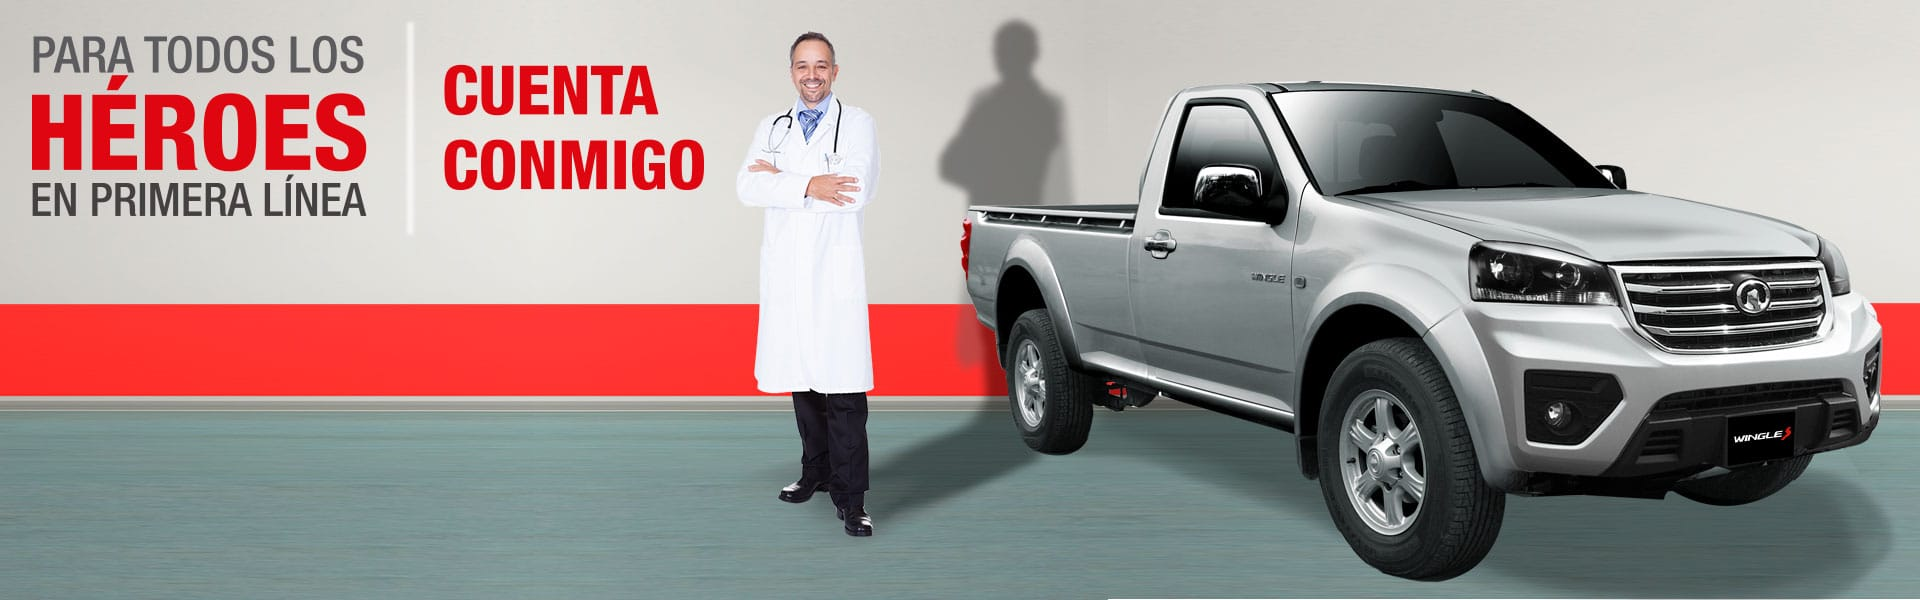 Campaña cuenta conmigo, médicos ecuatorianos camioneta Ambacar Great Wall cabina simple Wingle 5 motor a gasolina